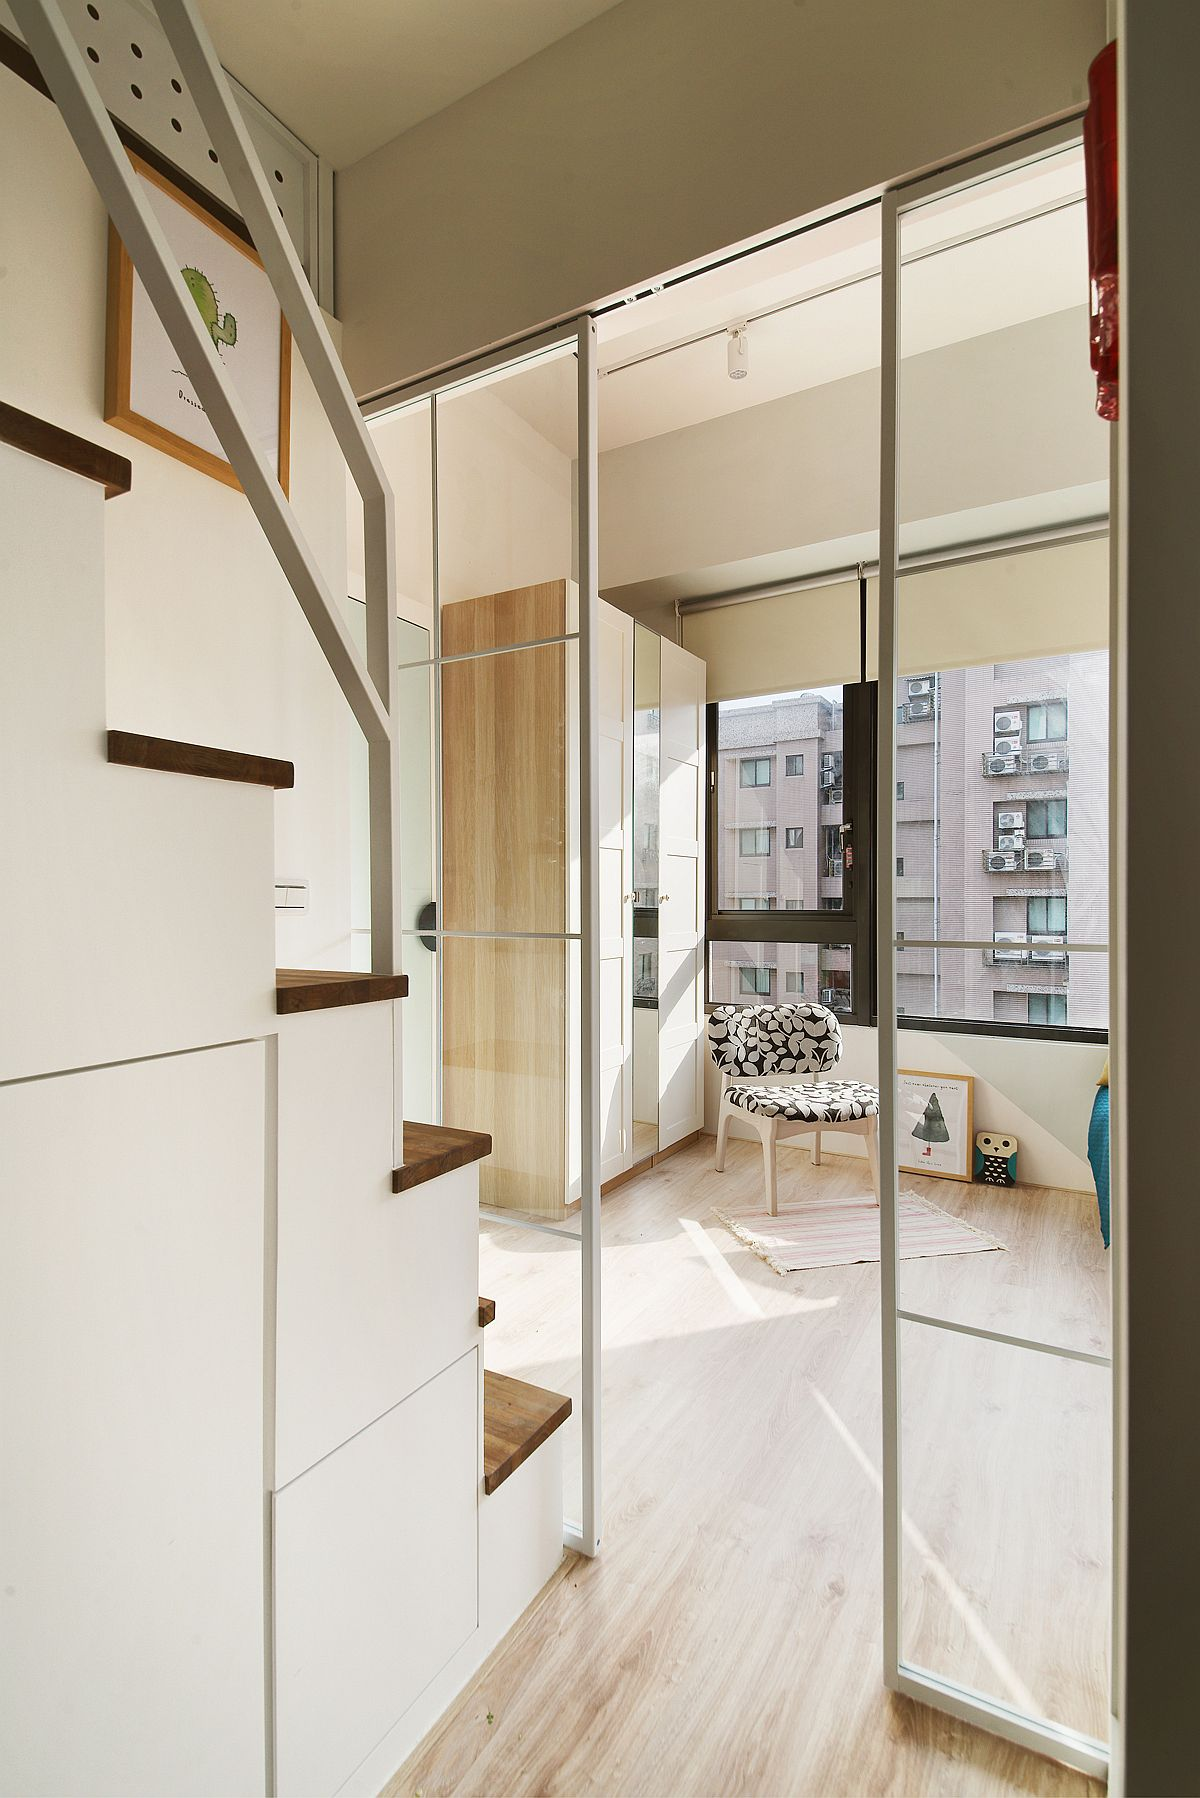 Custom-stairway-sliding-glass-doors-and-hidden-storage-units